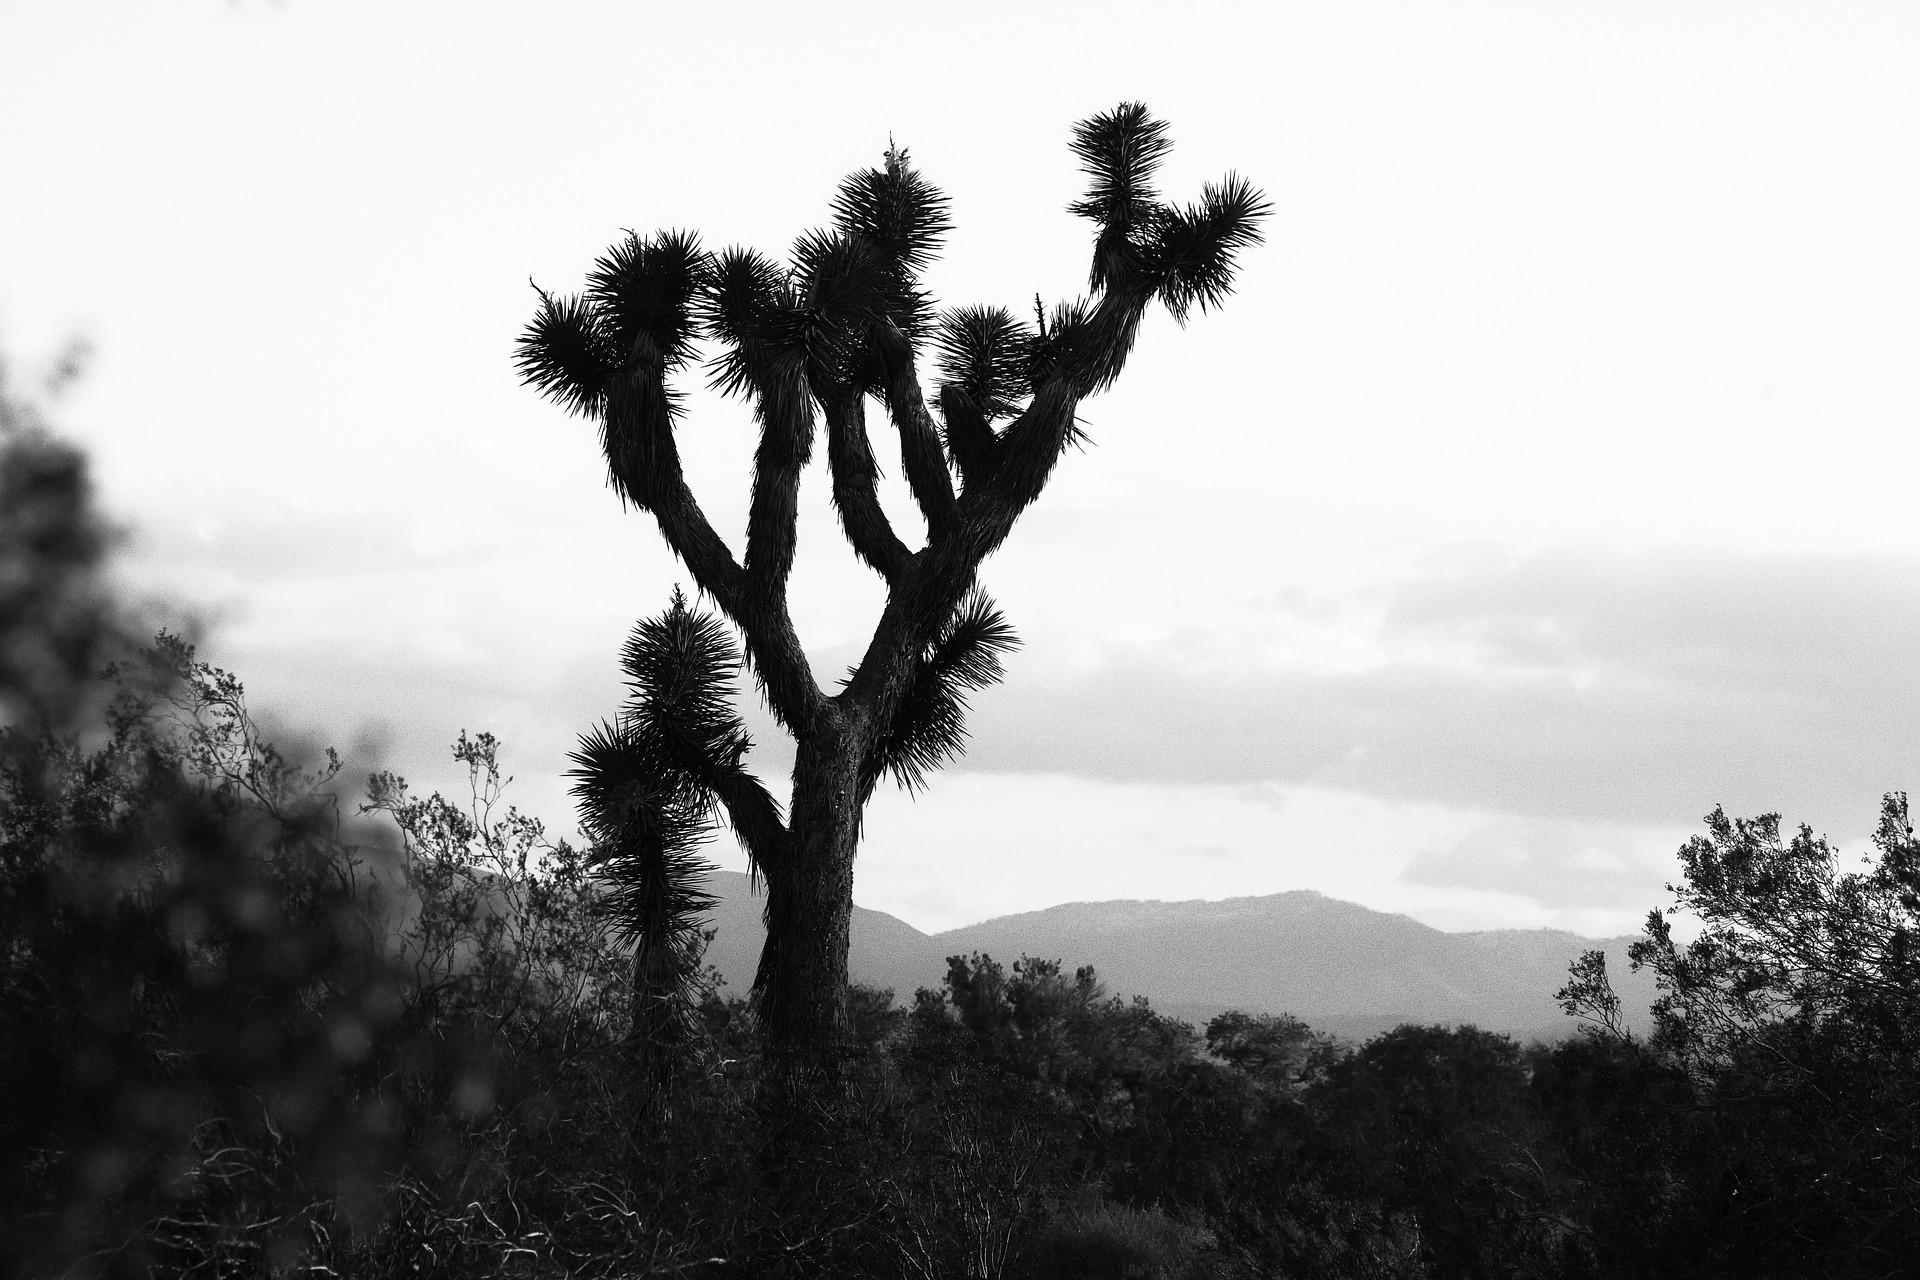 joshua-tree-841335_1920